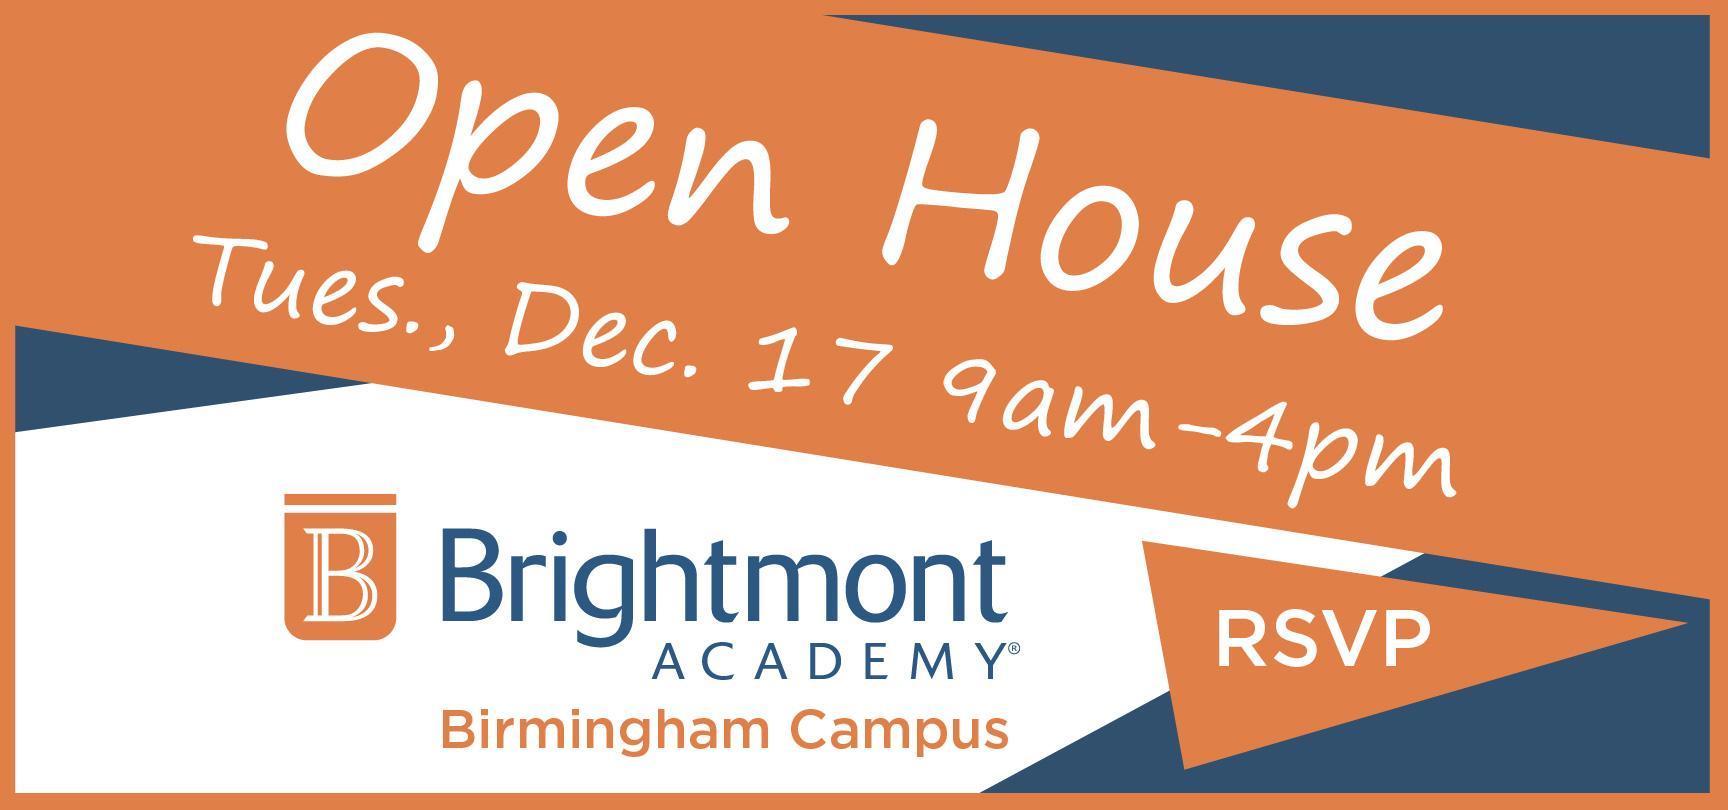 Brightmont Academy - Birmingham Open House